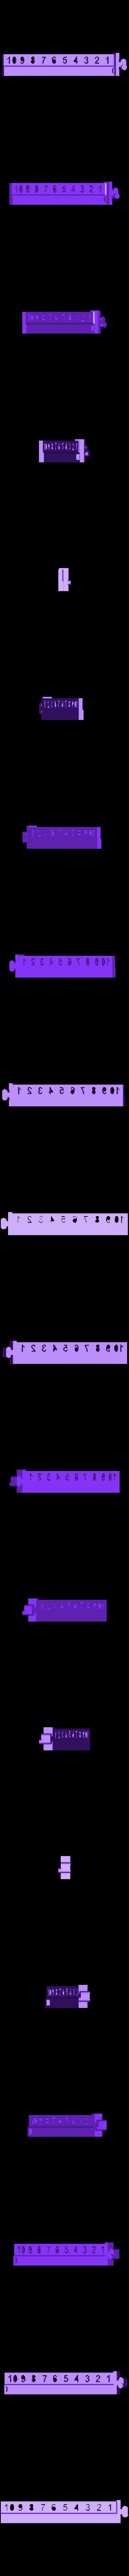 BeamL.stl Download free STL file Numerical Scale • 3D printable design, Duskwin